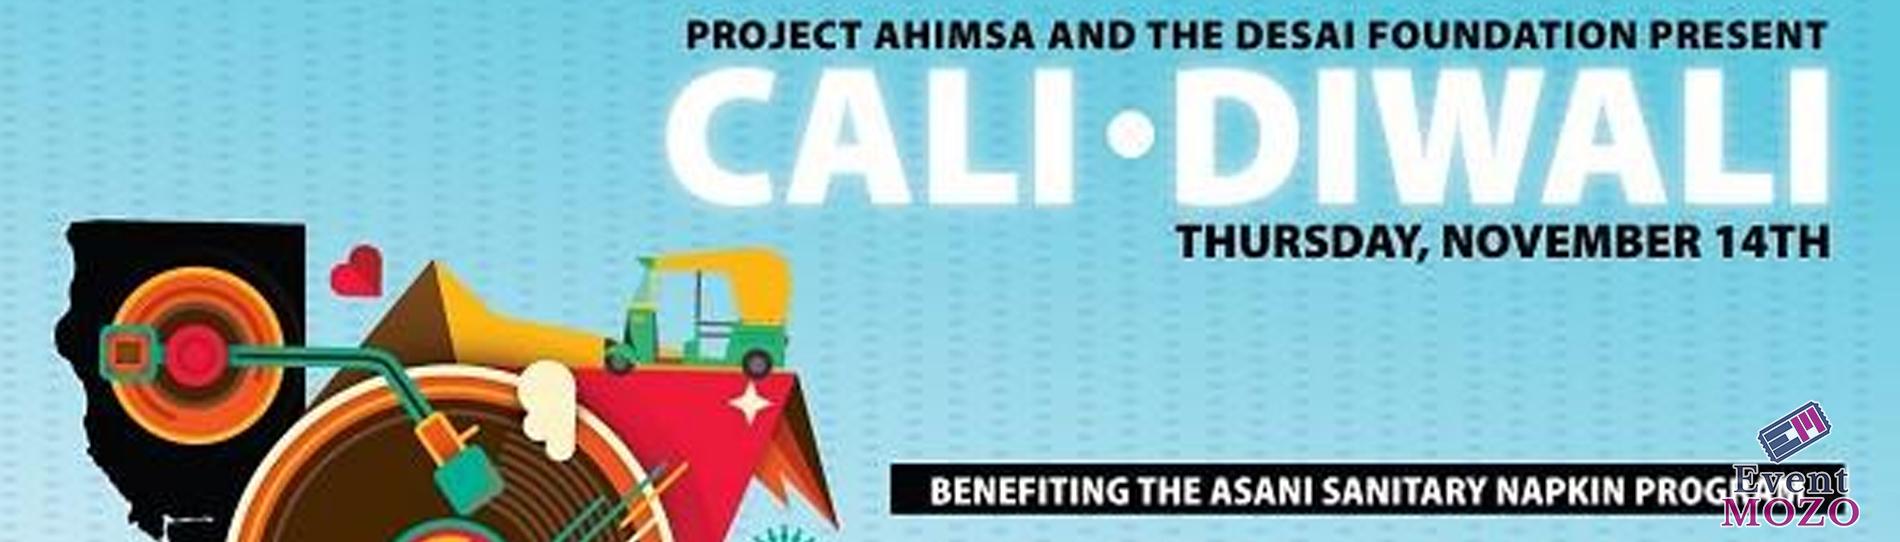 EventMozo Cali-Diwali - Presented by Project Ahimsa Plus The Desai F....